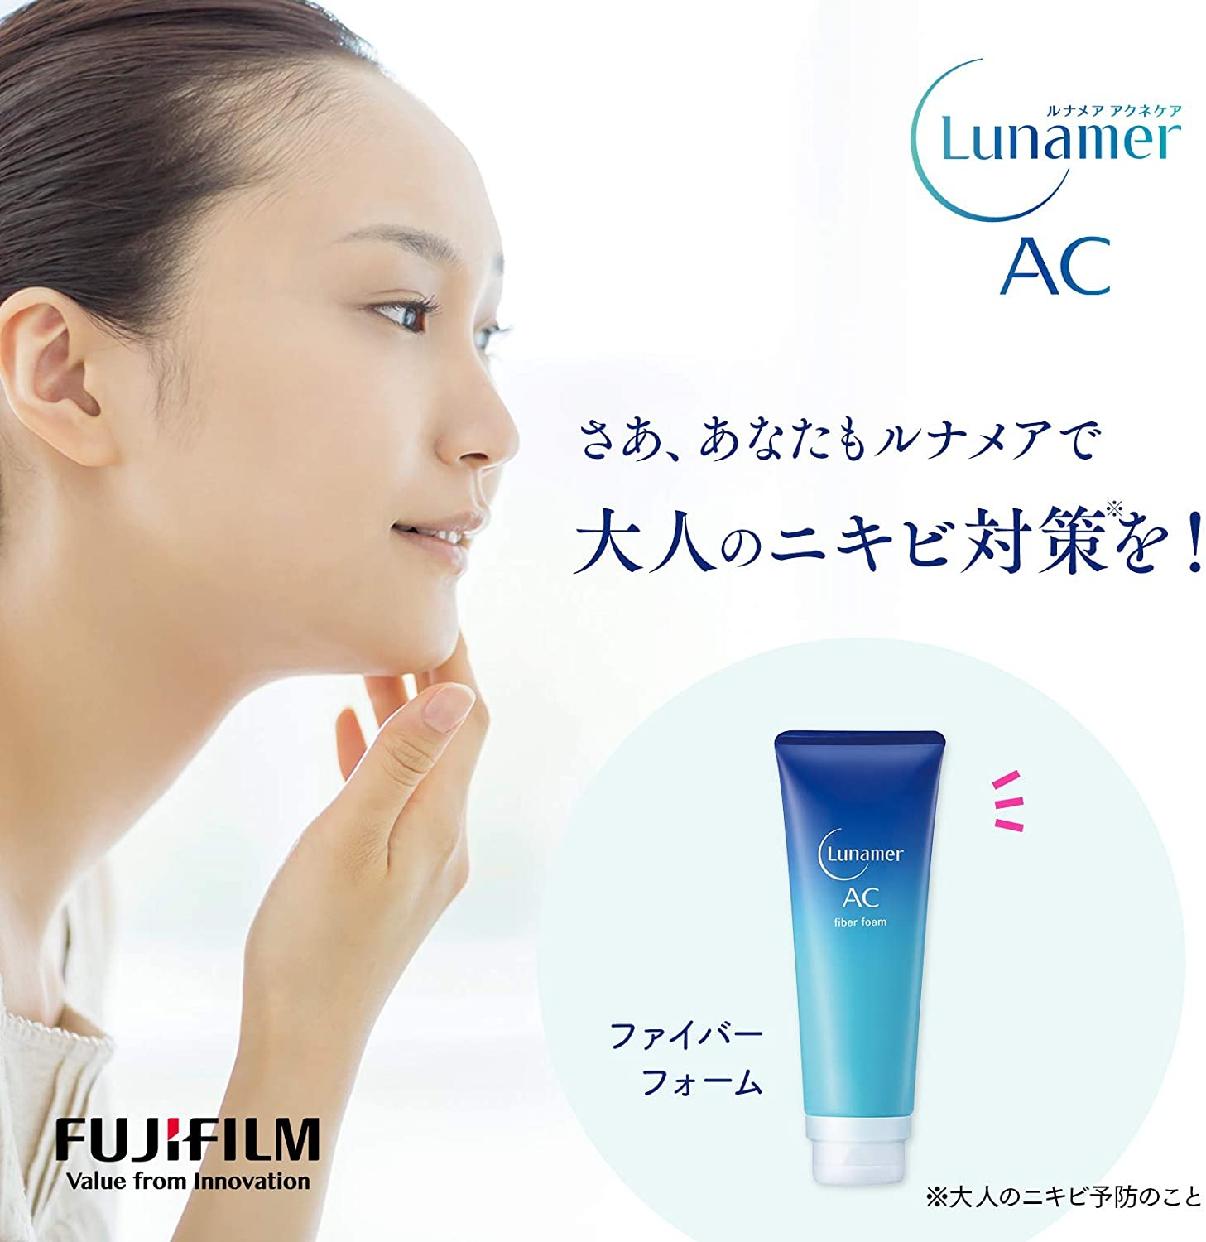 Lunamer AC(ルナメアAC) ファイバーフォームの商品画像5